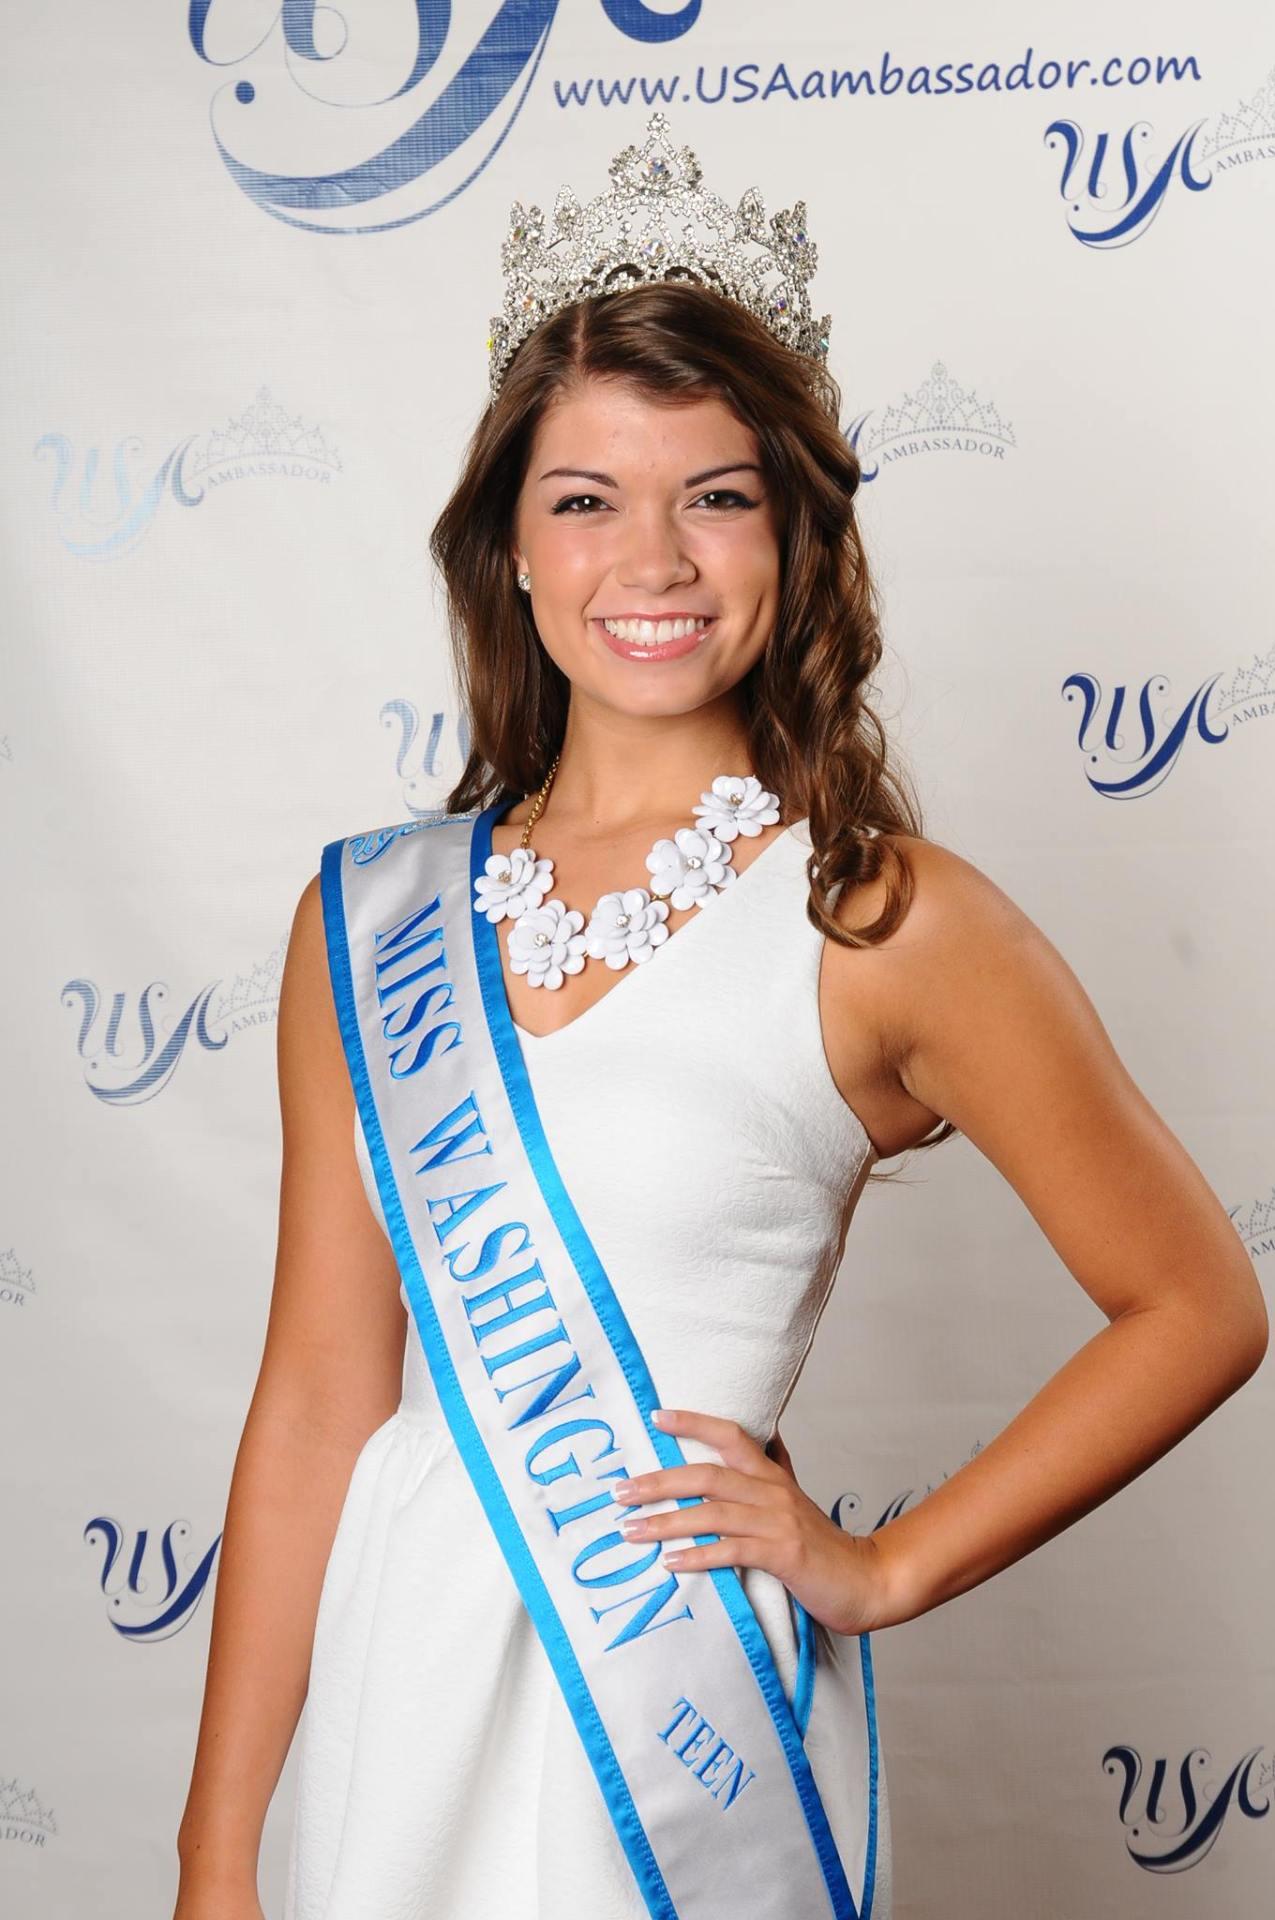 Candidatas a Miss Teen USA 2016 - Página 4 Tumblr_o9dyn2buI61ttvyeto1_1280